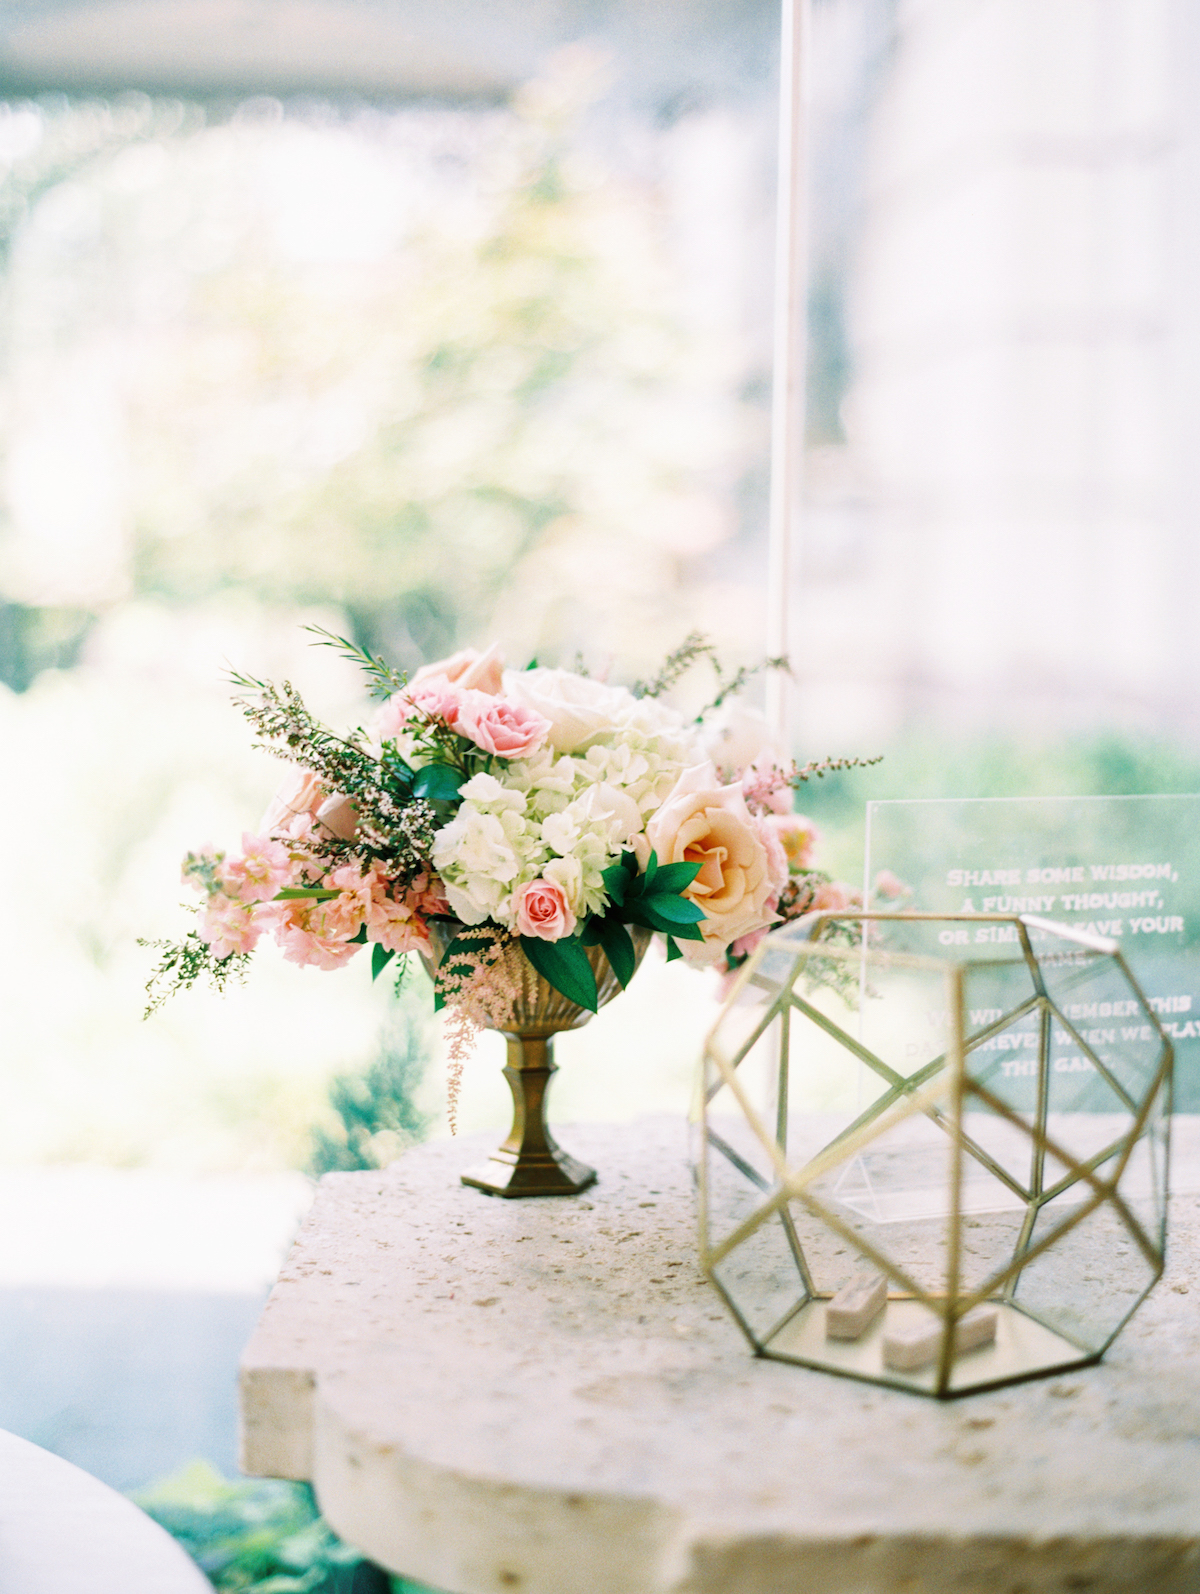 Gold and Blush Wedding Decorations - Elizabeth Anne Designs: The ...